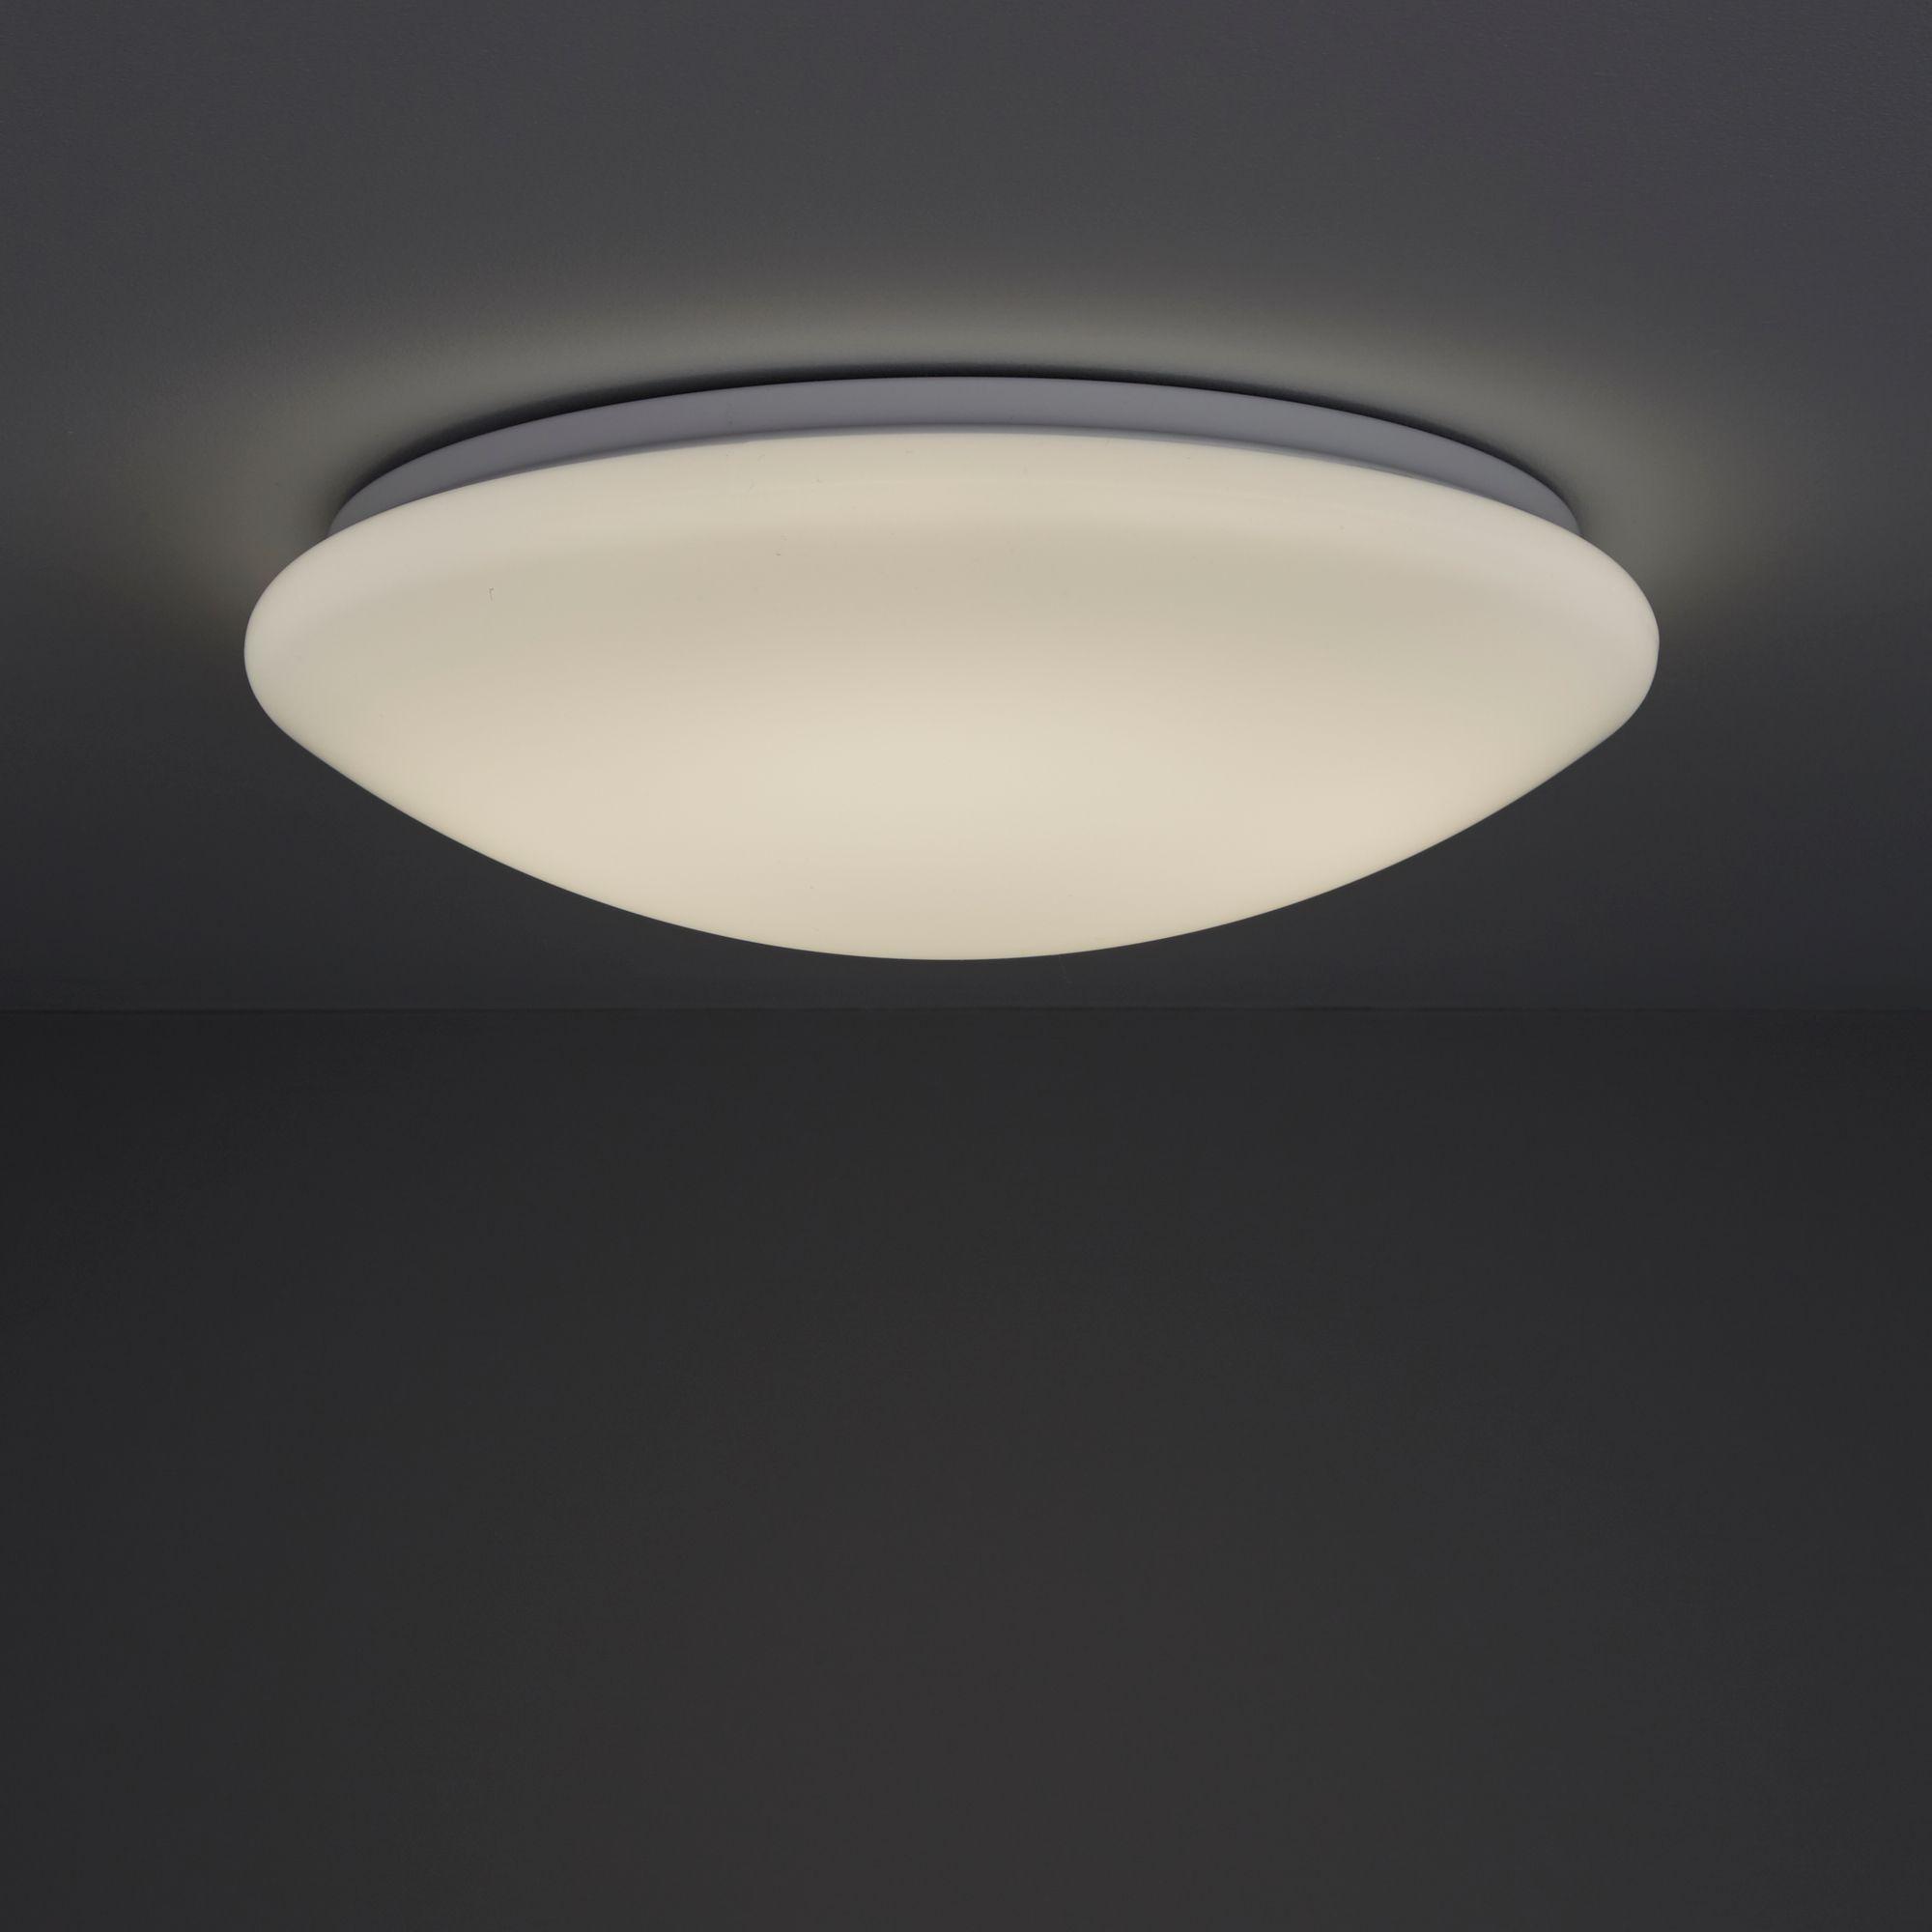 Dea Medium White Ceiling Light